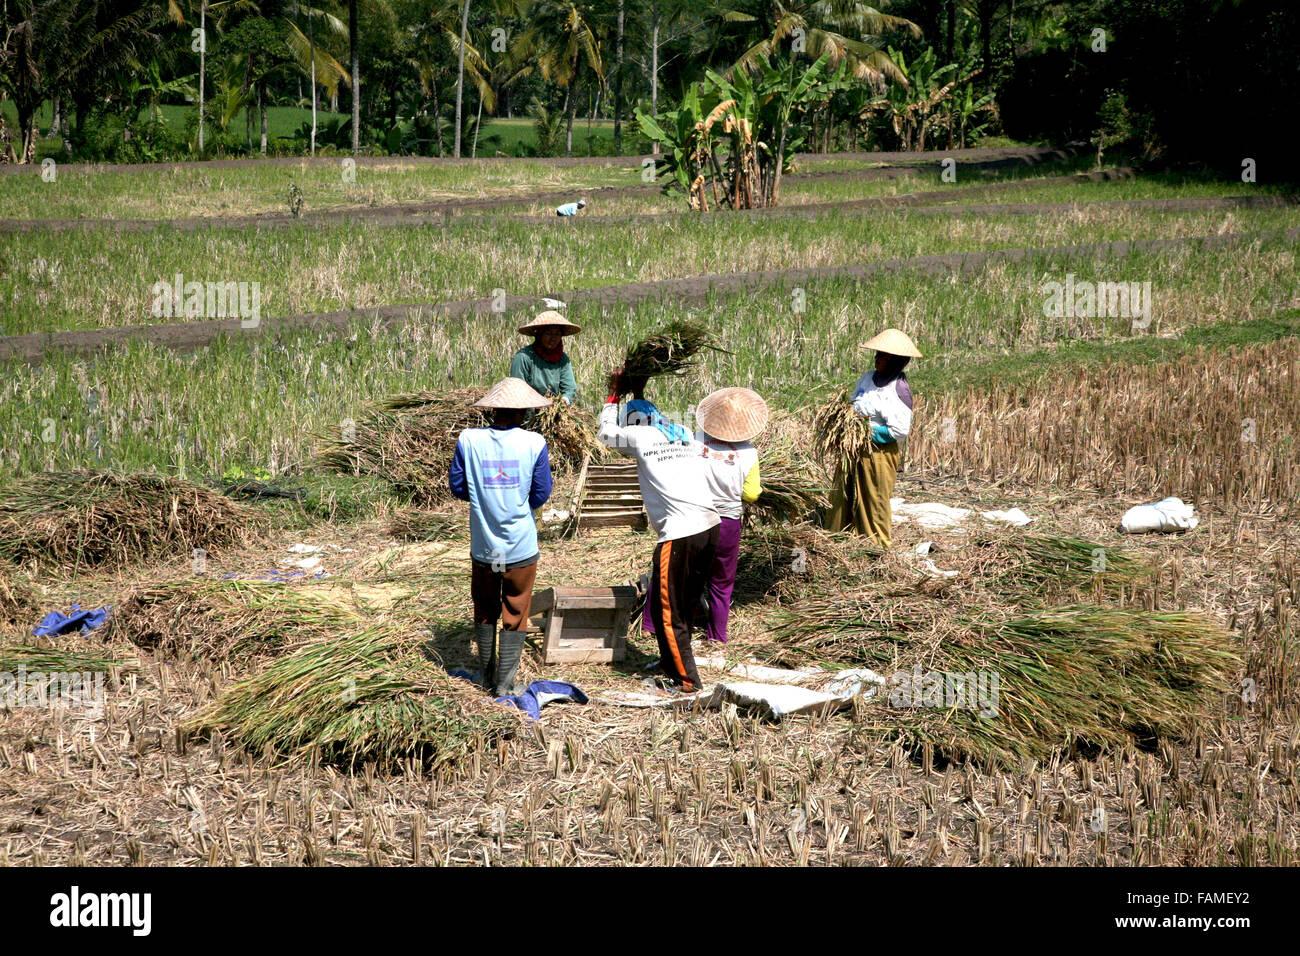 Indonesia Central Java Jogjakarta The rice harvest  Adrian Baker - Stock Image